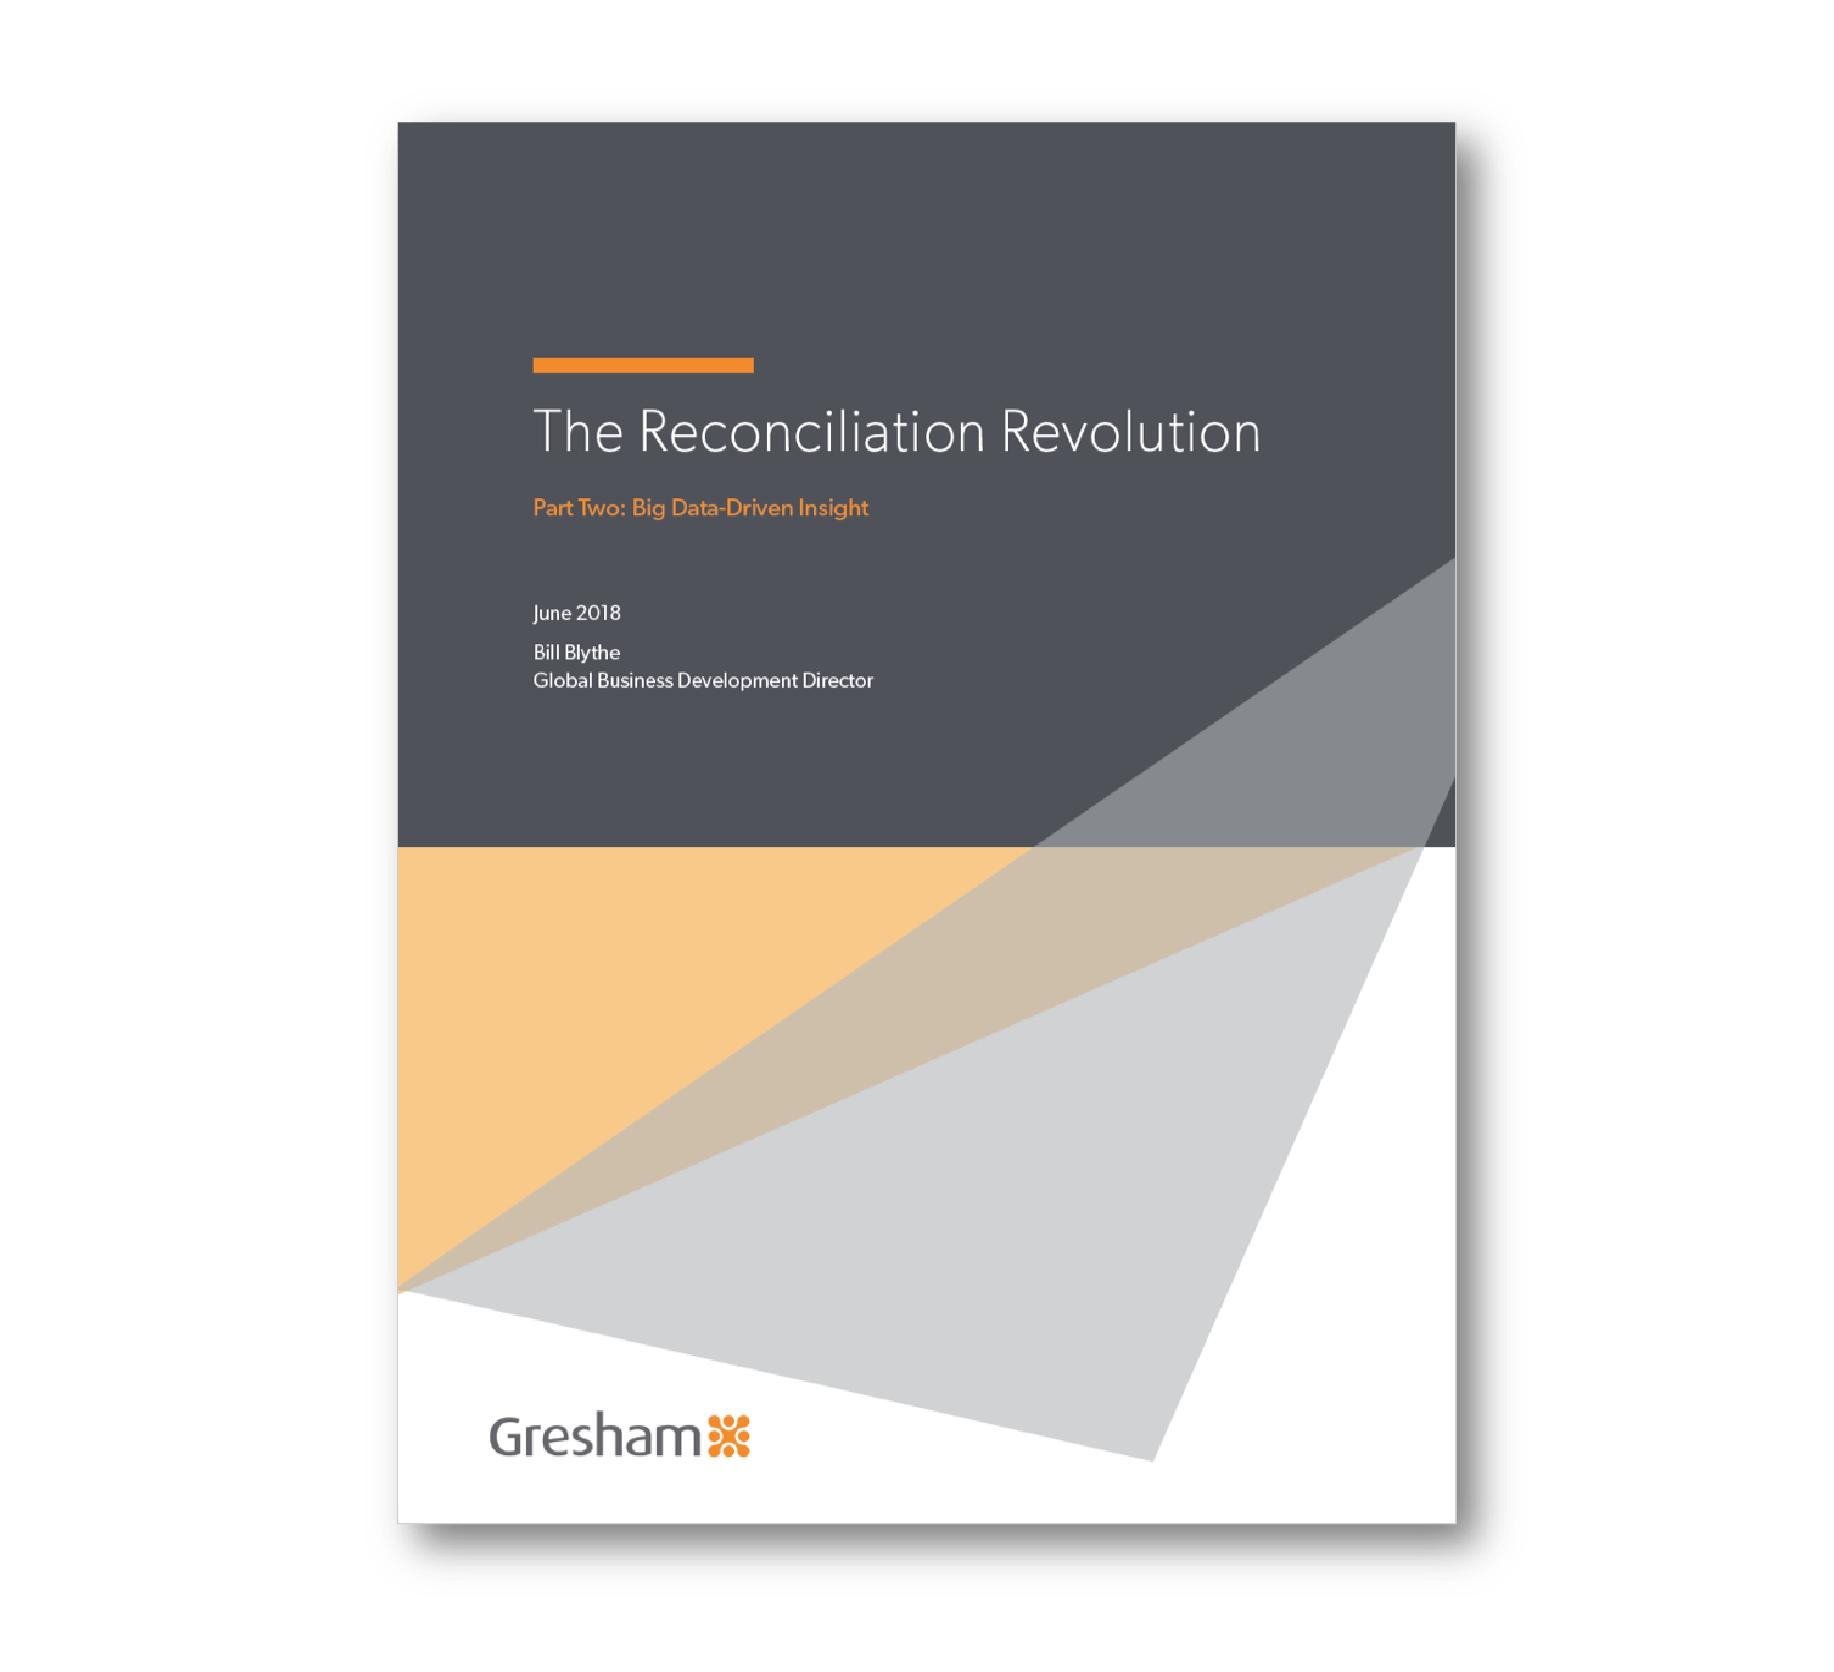 The Reconciliation Revolution - Part Two